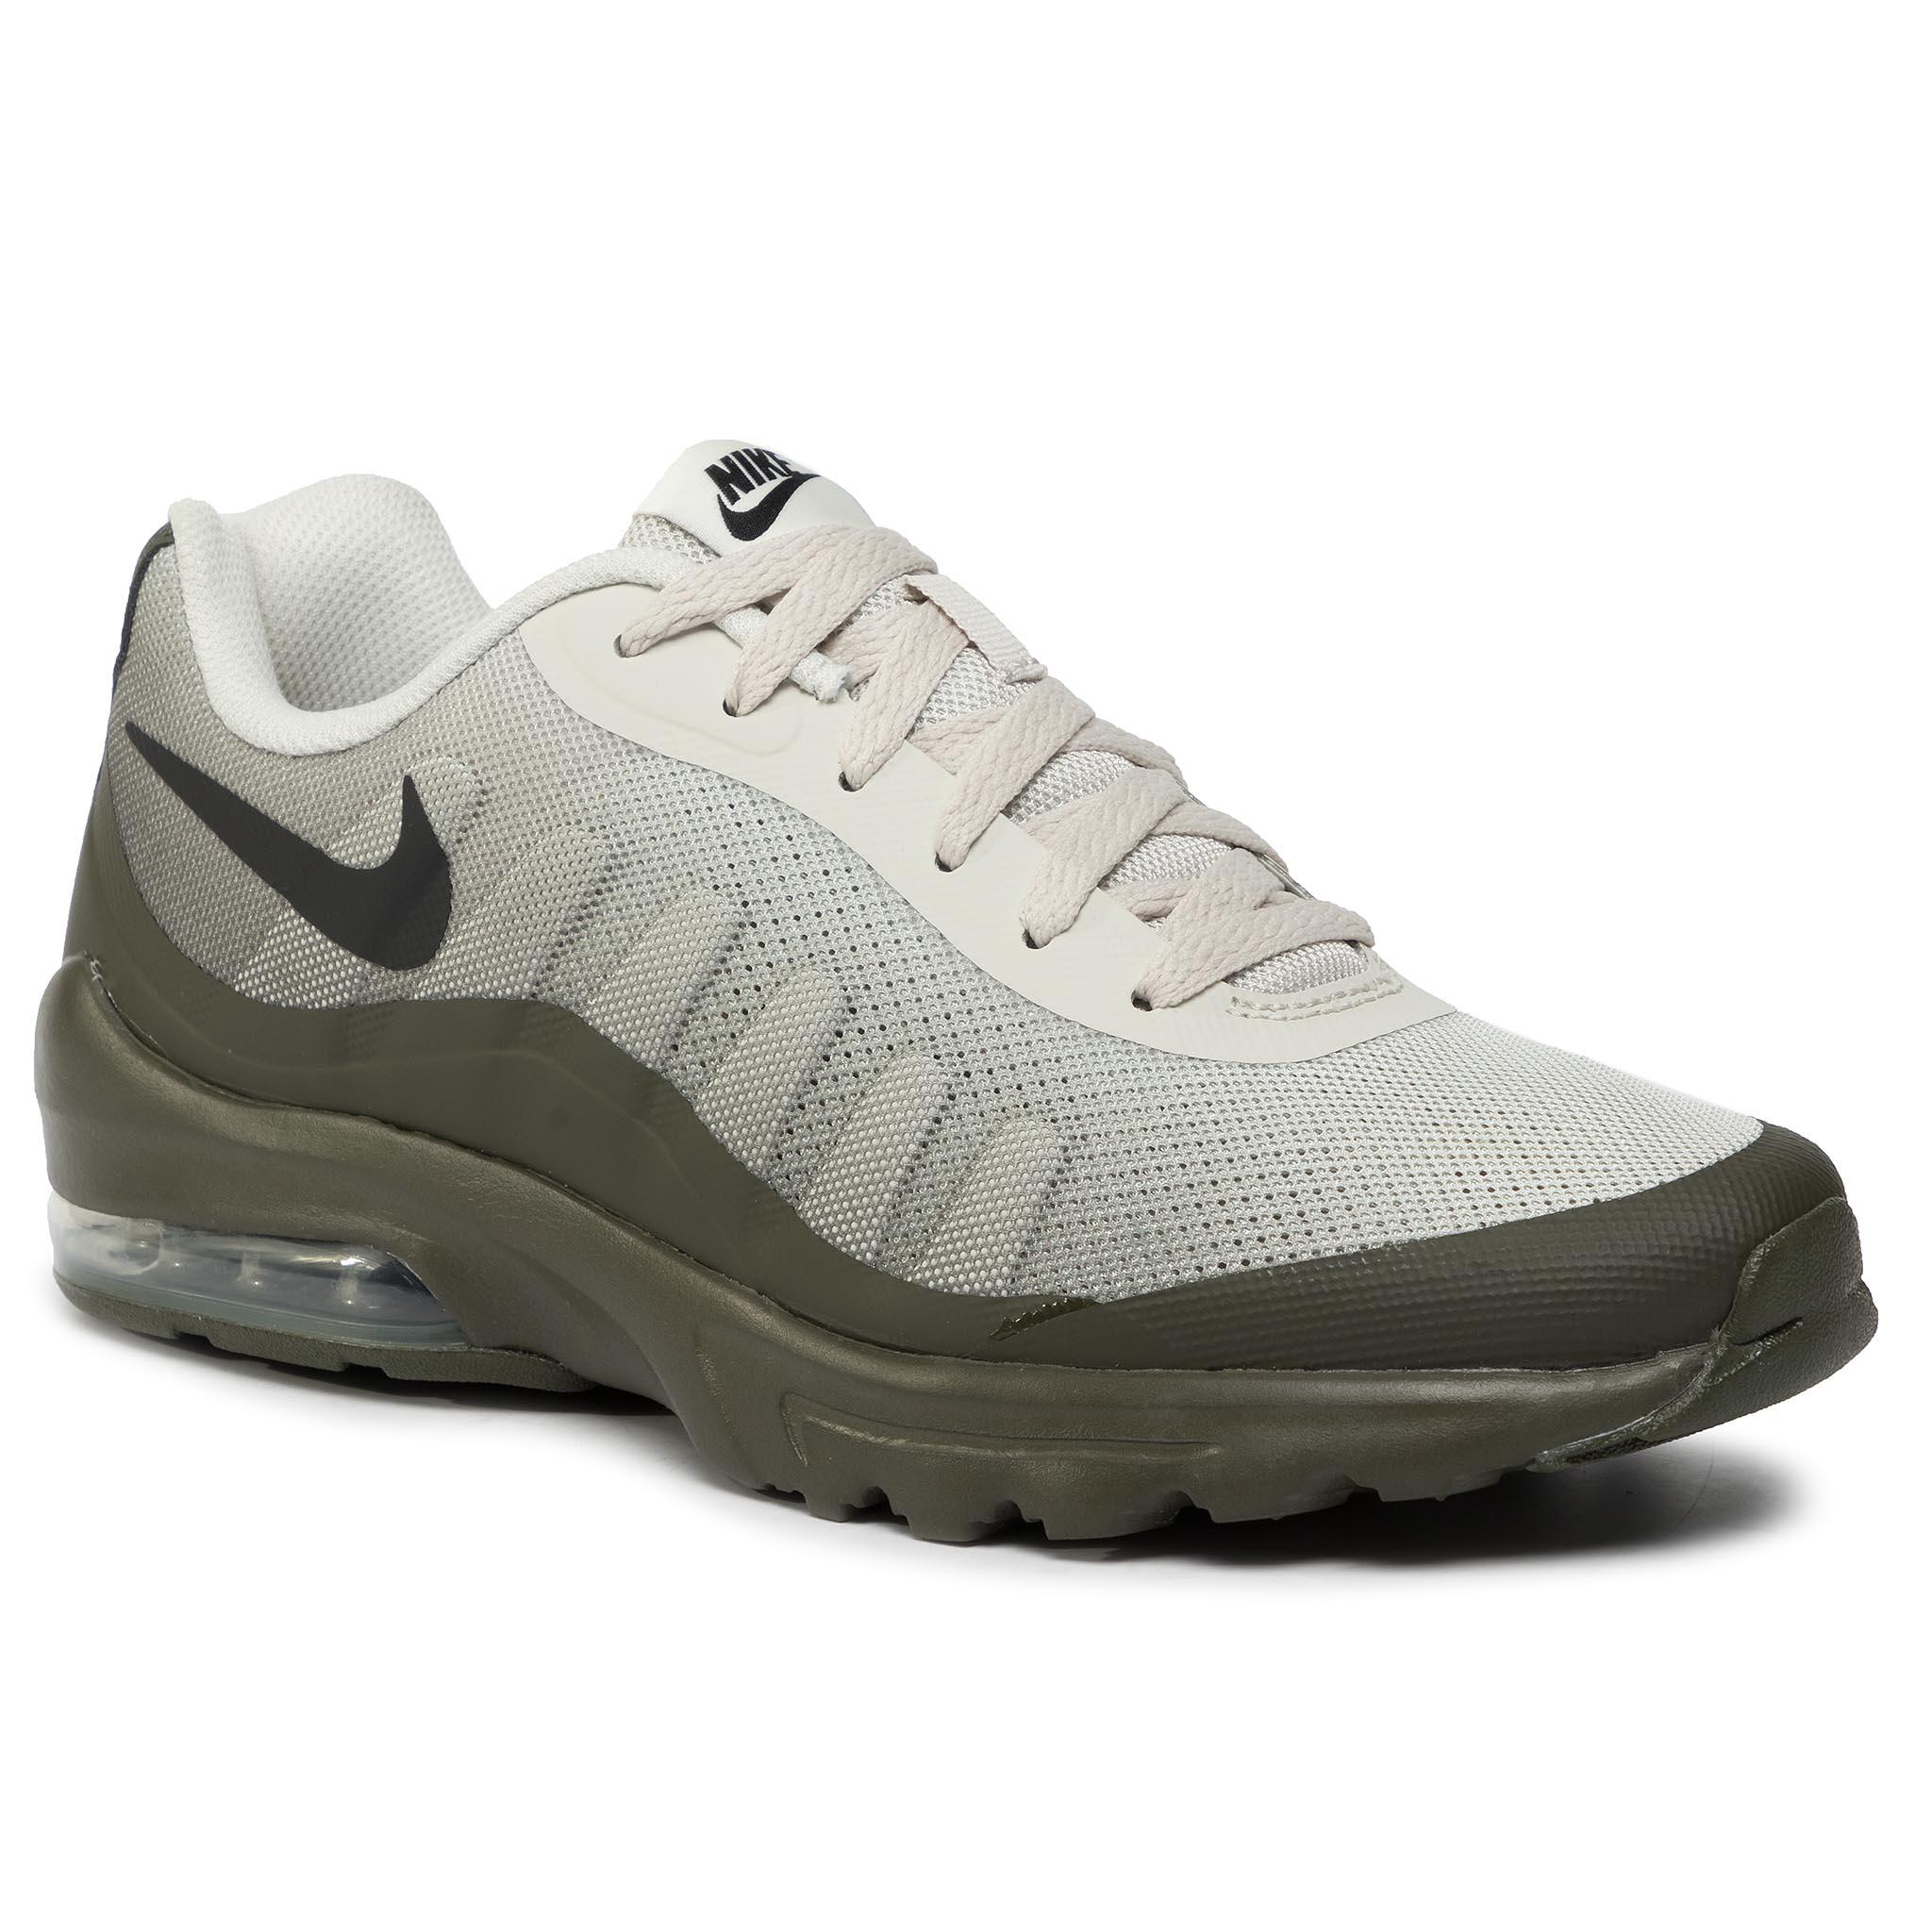 Shoes NIKE Air Max Invigor 749680 401 ObsidianWhie